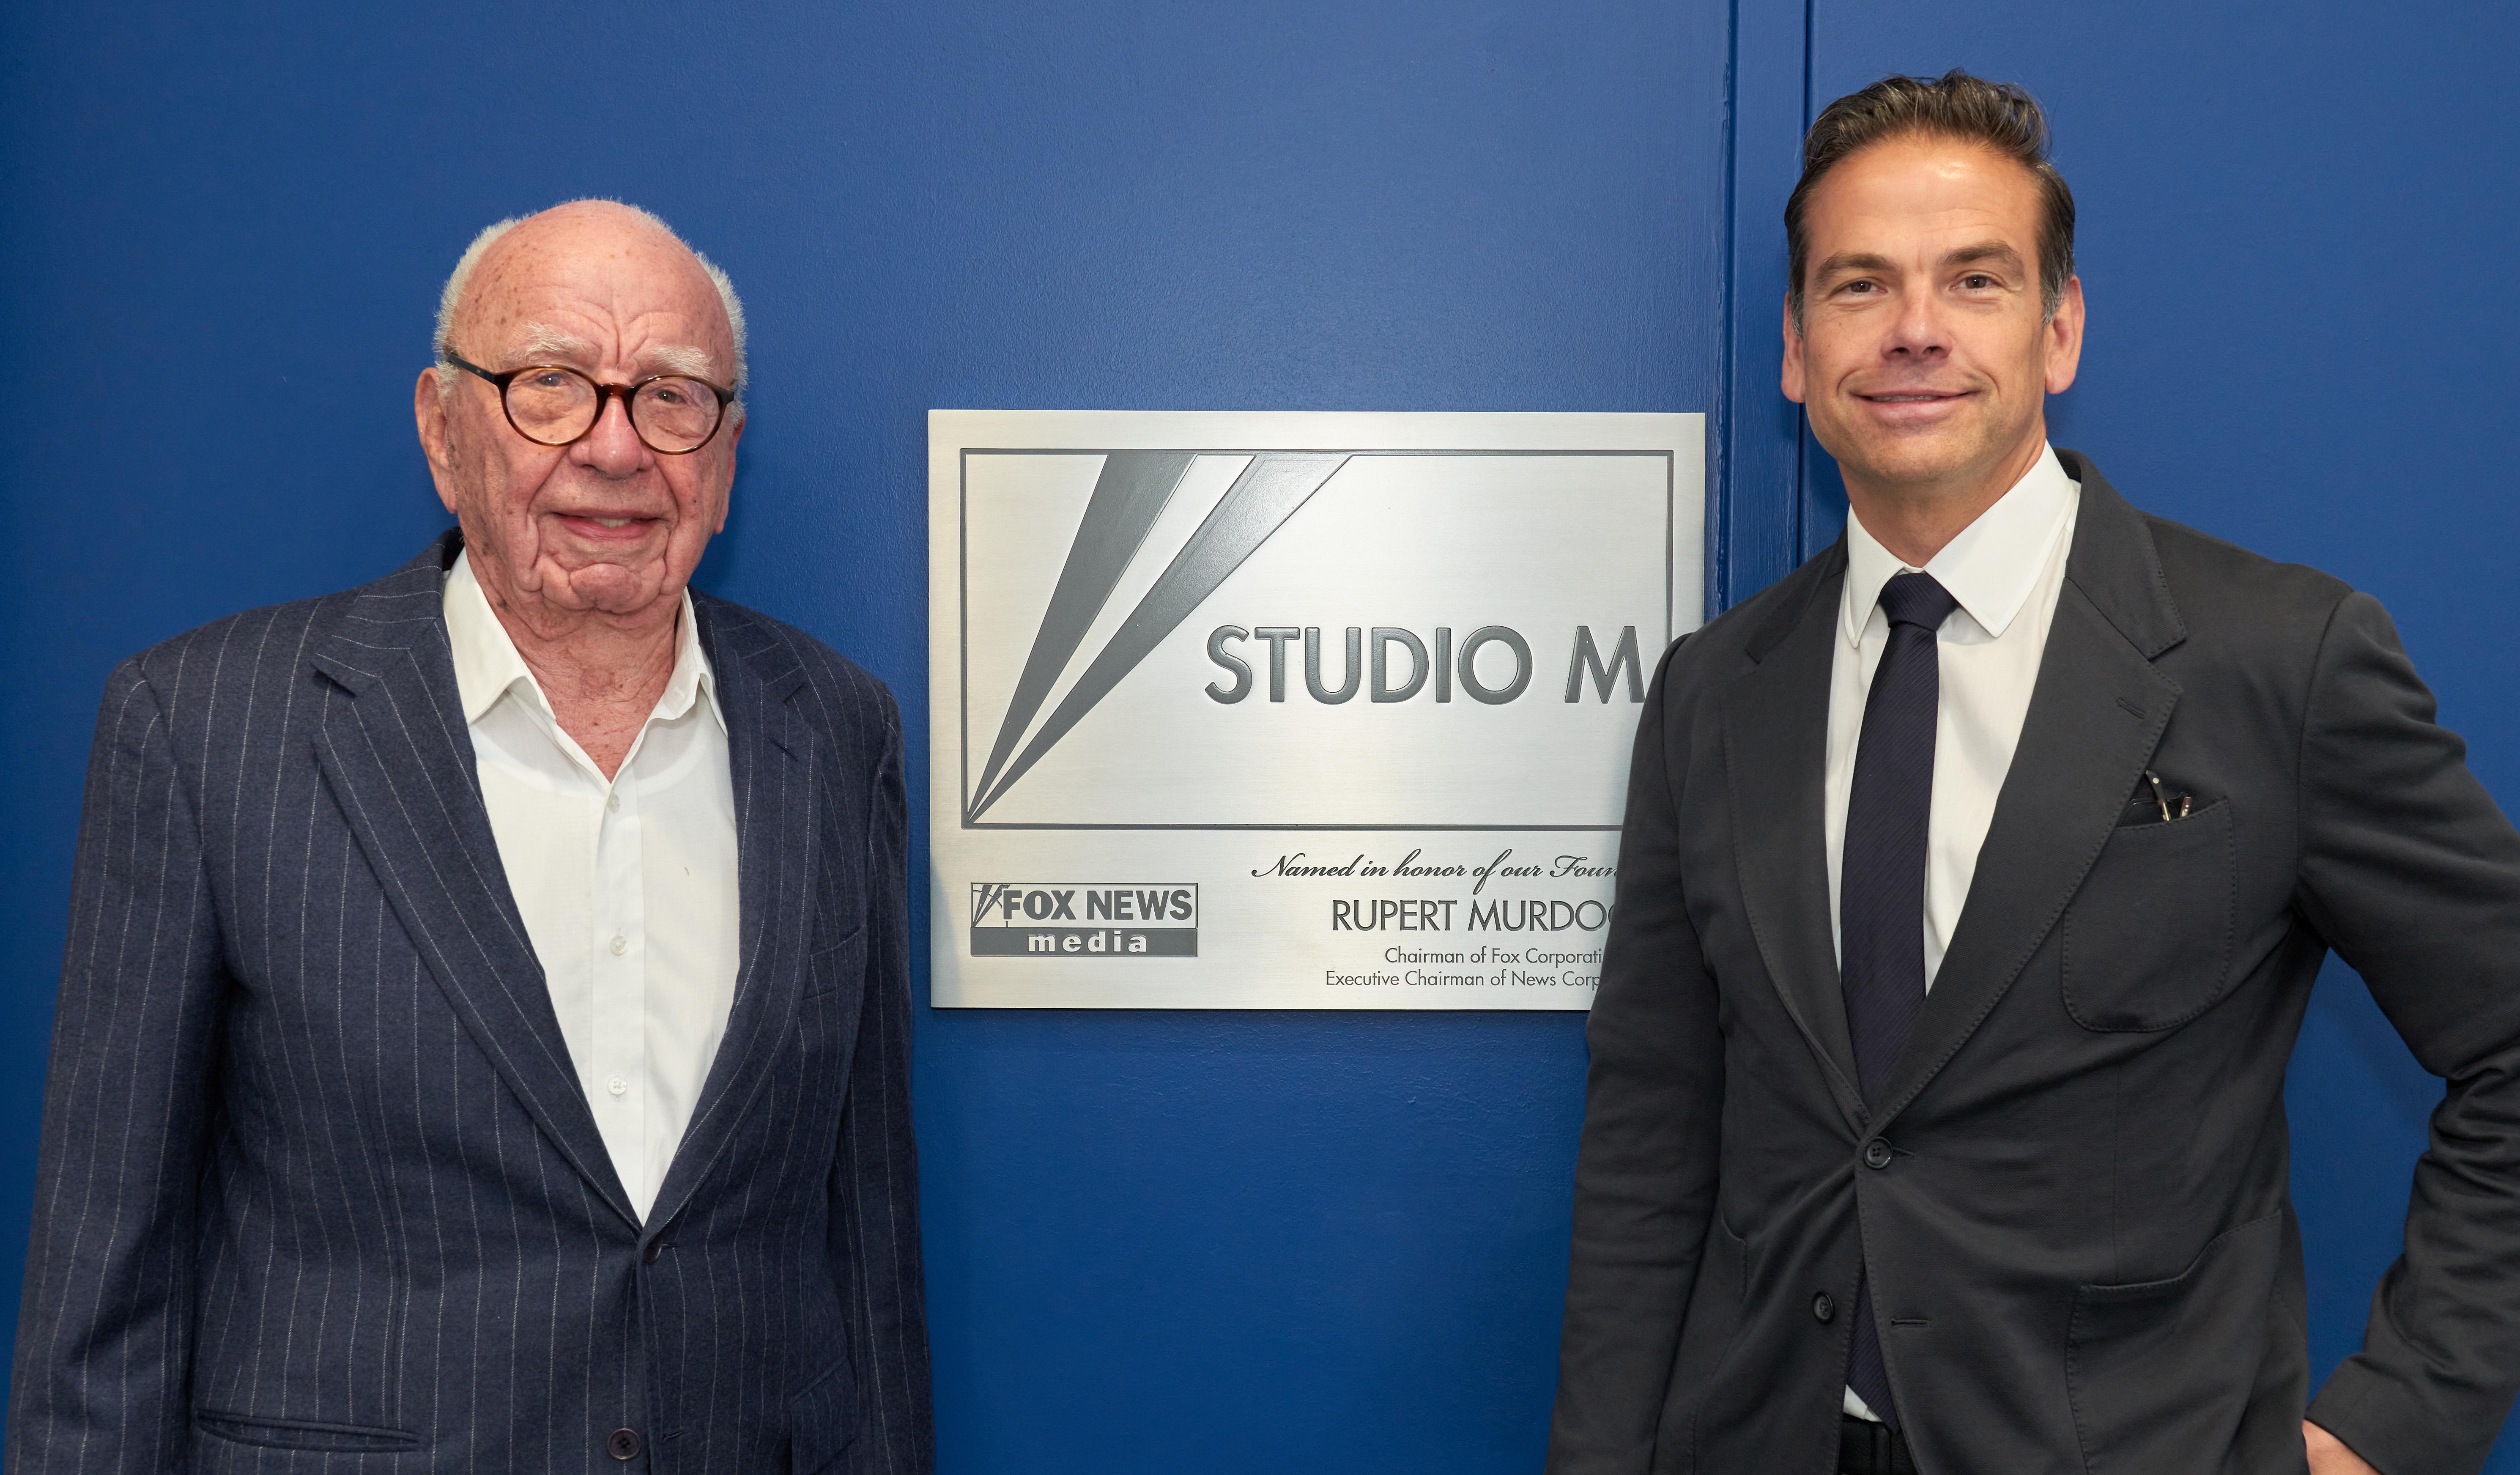 Fox News Channel Dedicates Studio to Rupert Murdoch